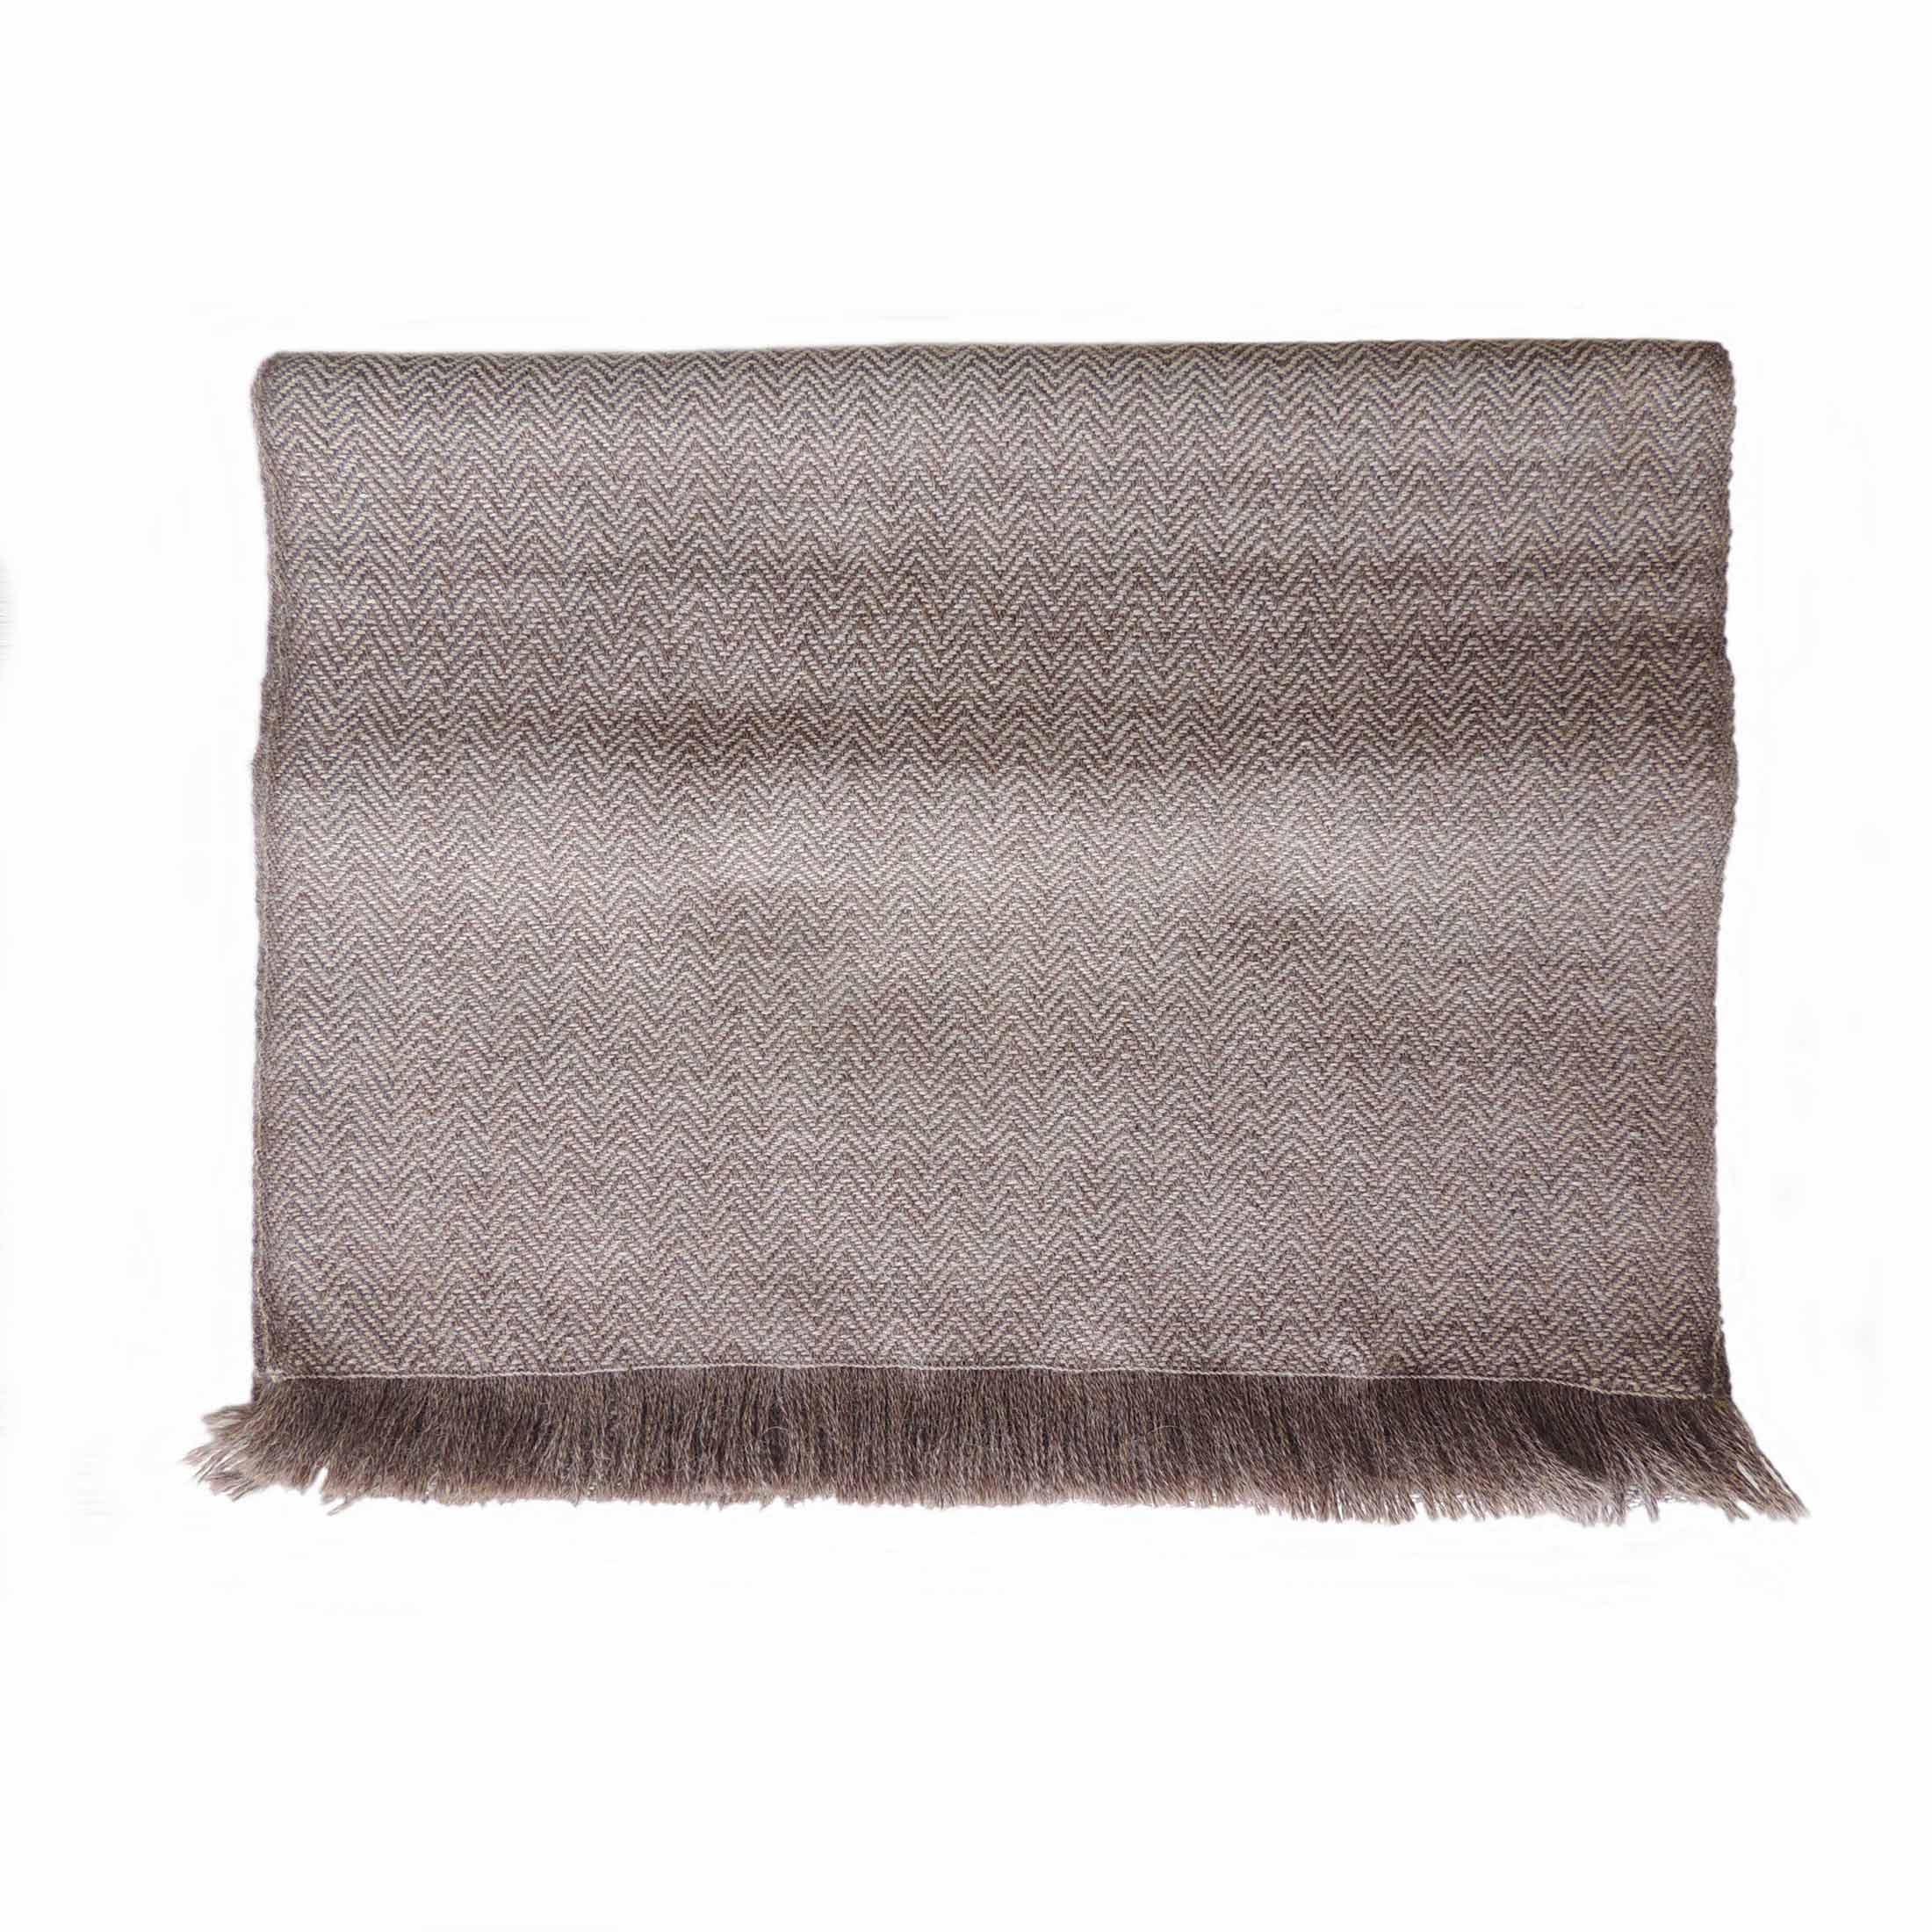 PopsFL Peru wholesale manufactor Handwoven Scarf with herringbone pattern, baby alpaca with fringes.